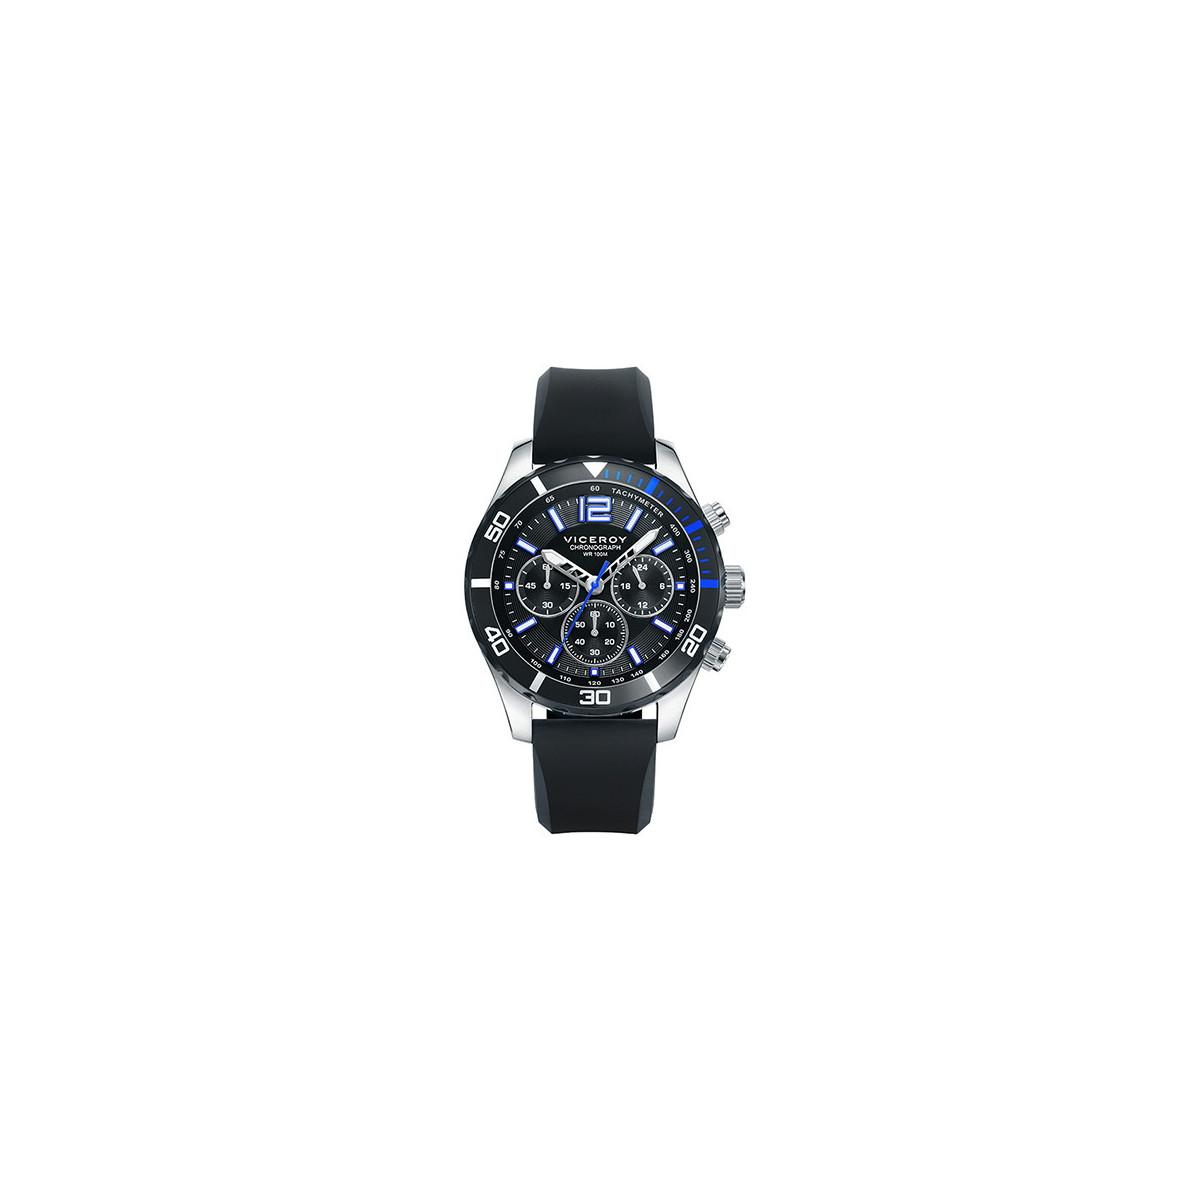 Reloj Viceroy Crono 401023-55